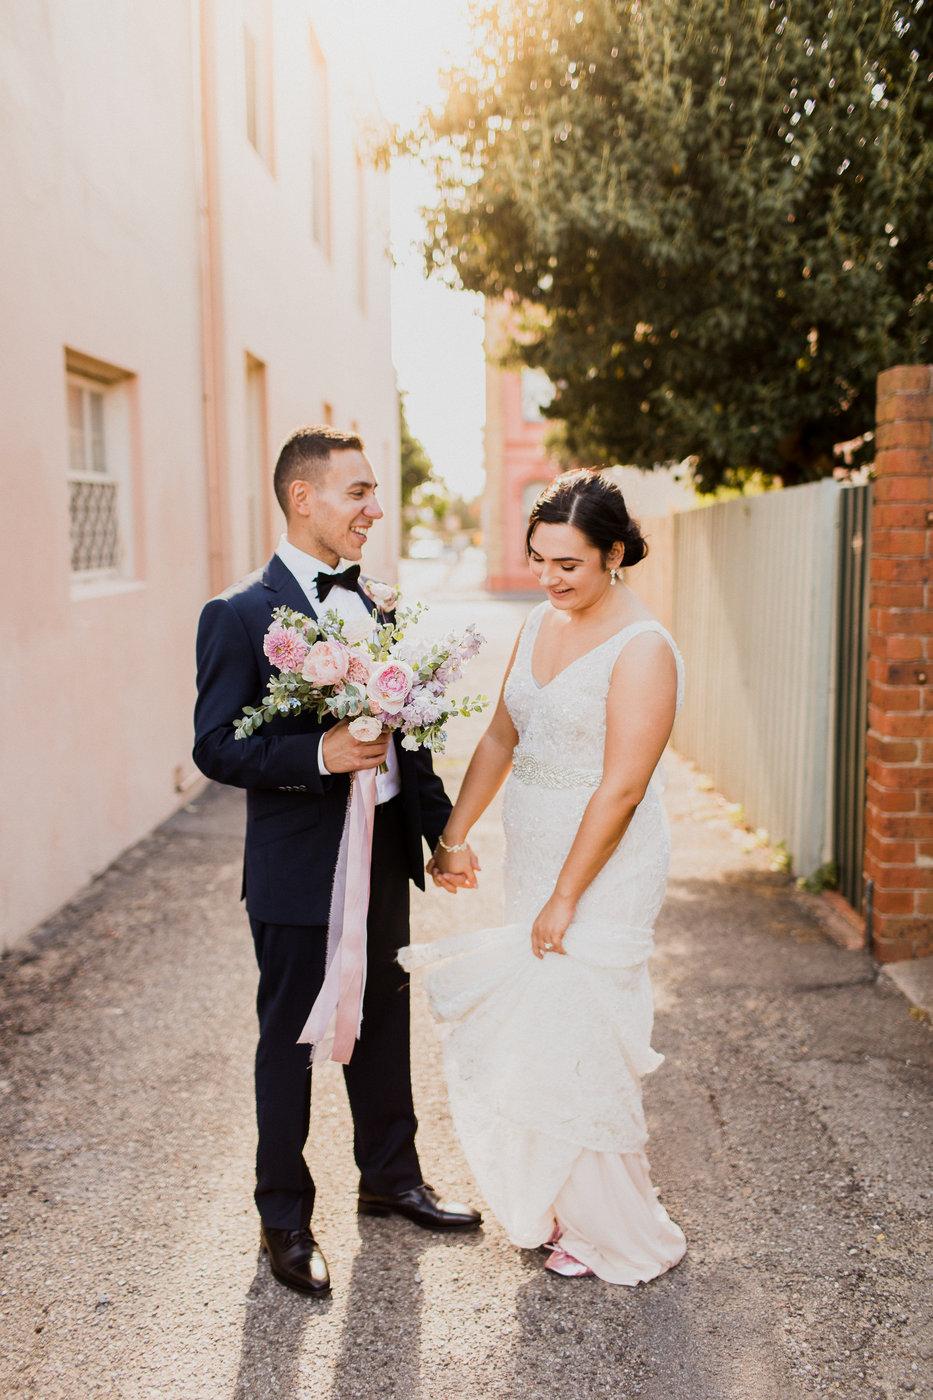 Anna+Nathan-WEDDING IMAGES-FYJlw564778393.jpg